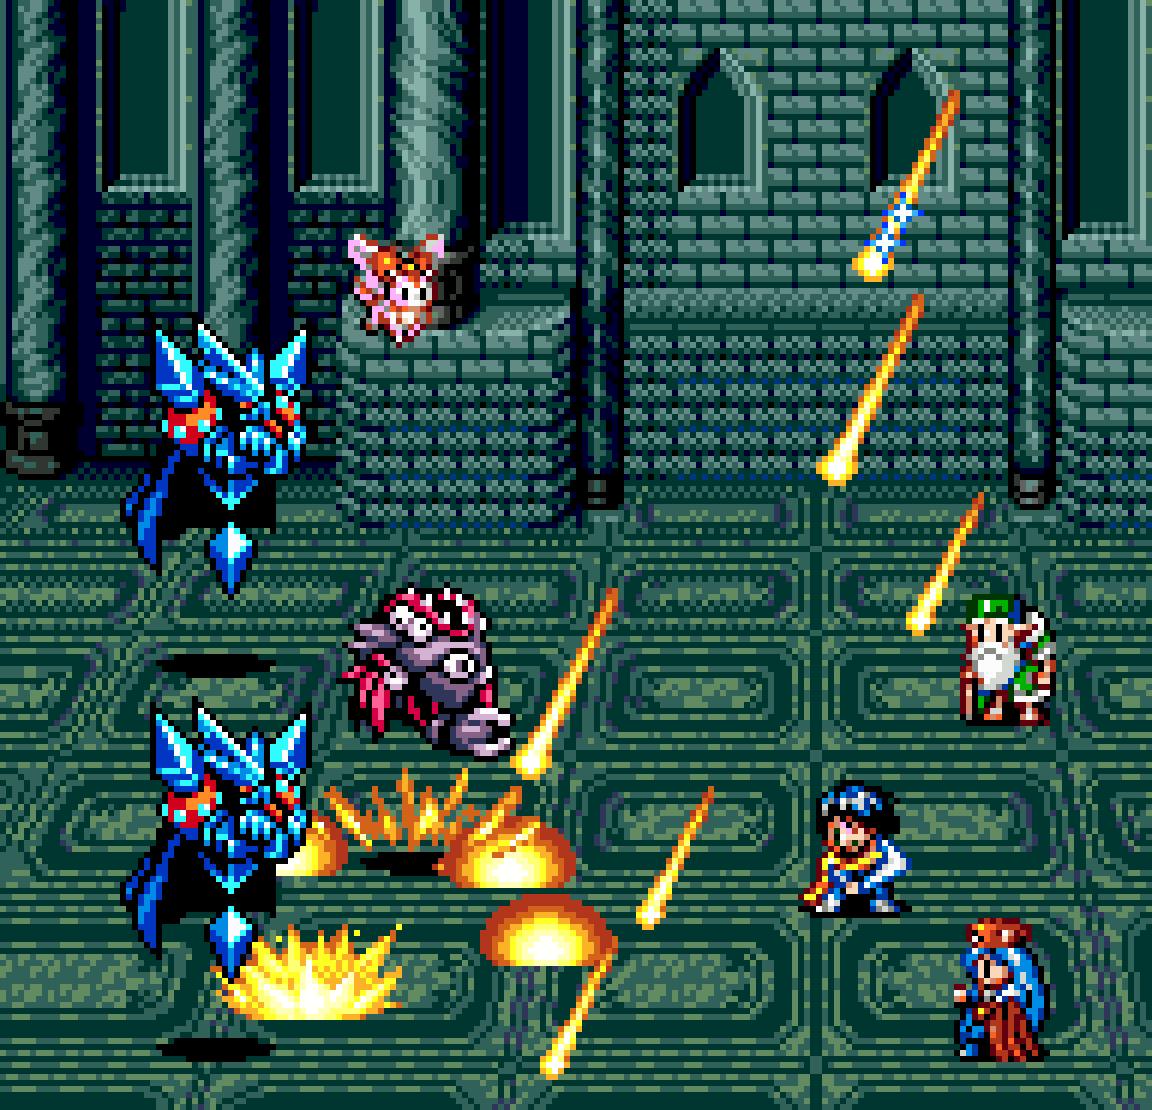 RPG Video Games, Anime, and more | Videogames | Sega cd